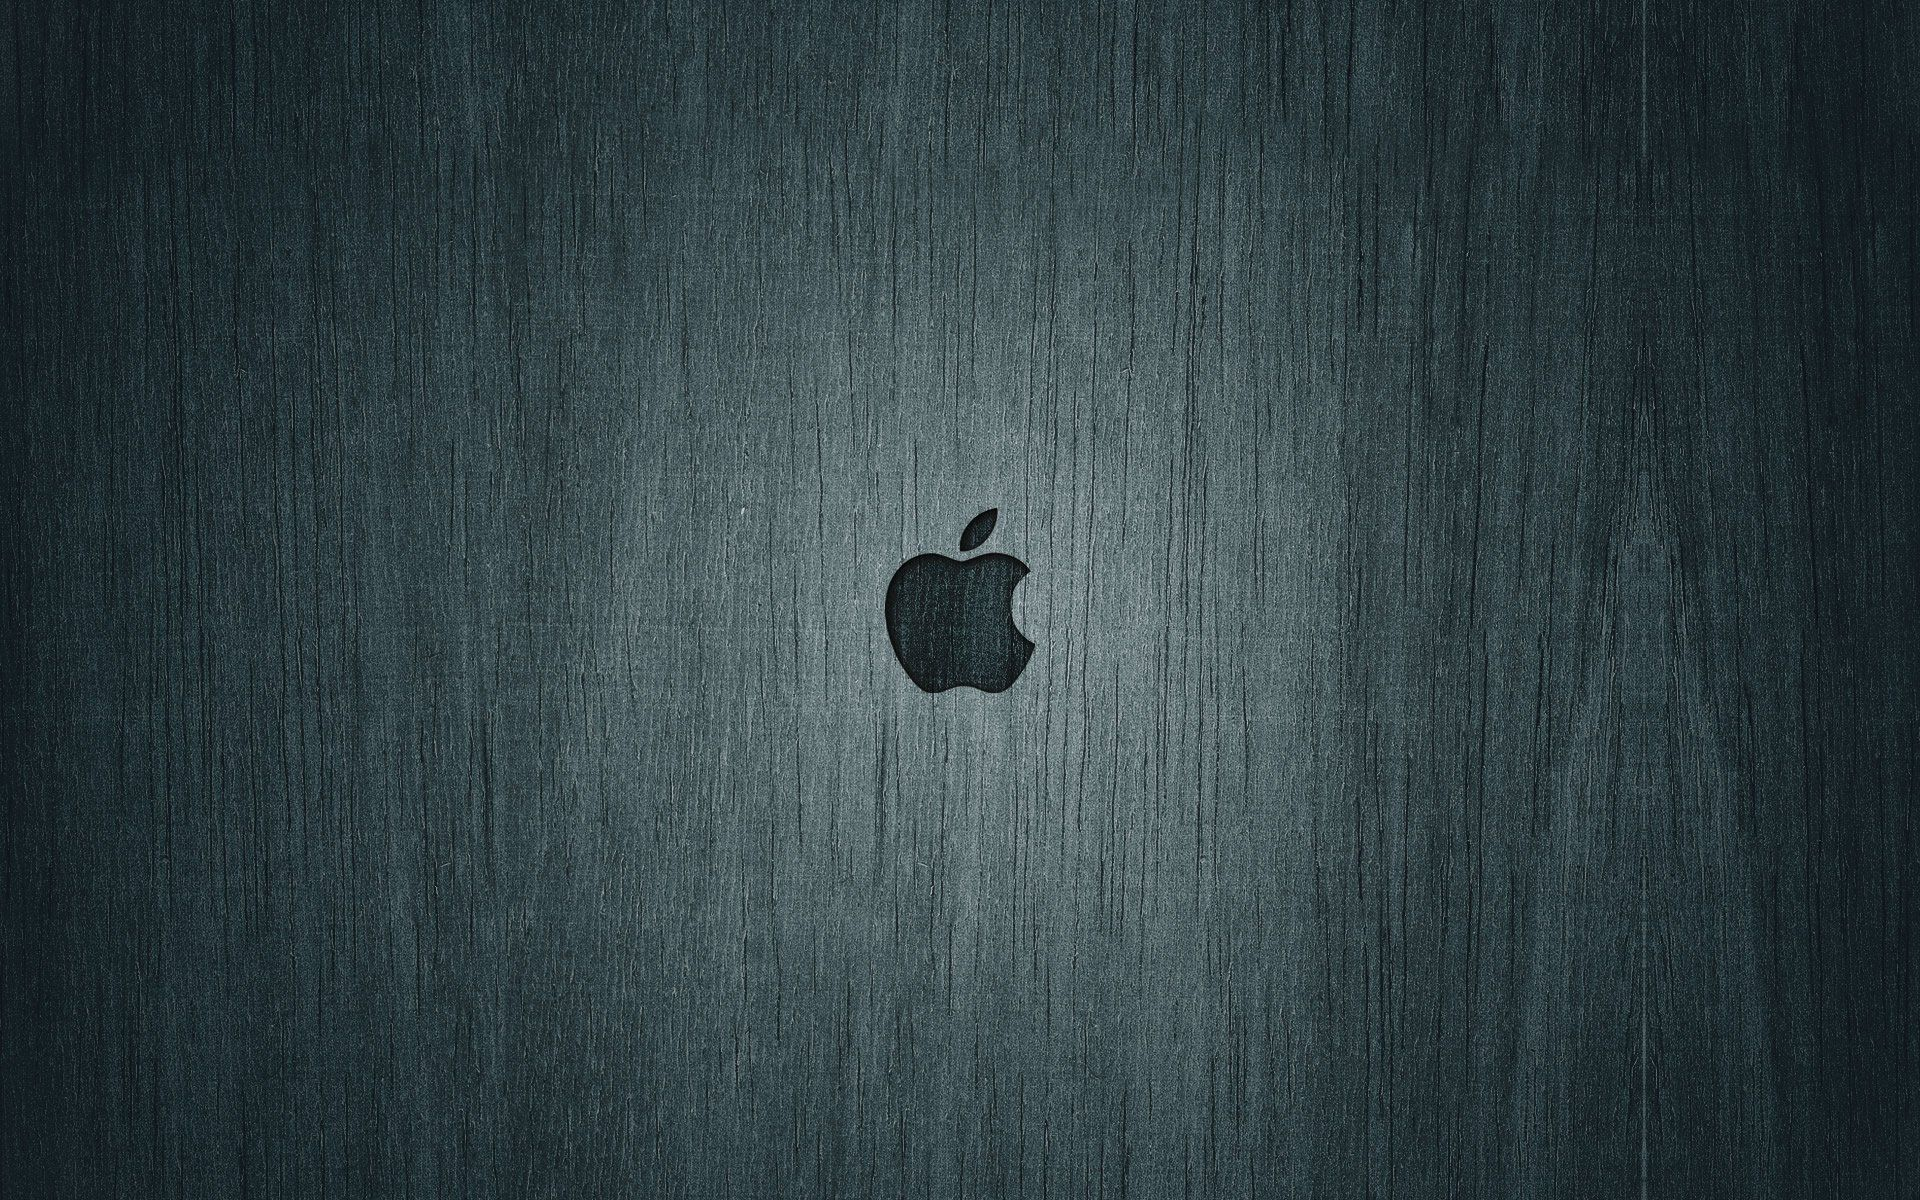 Cool Wallpaper Computer Apple